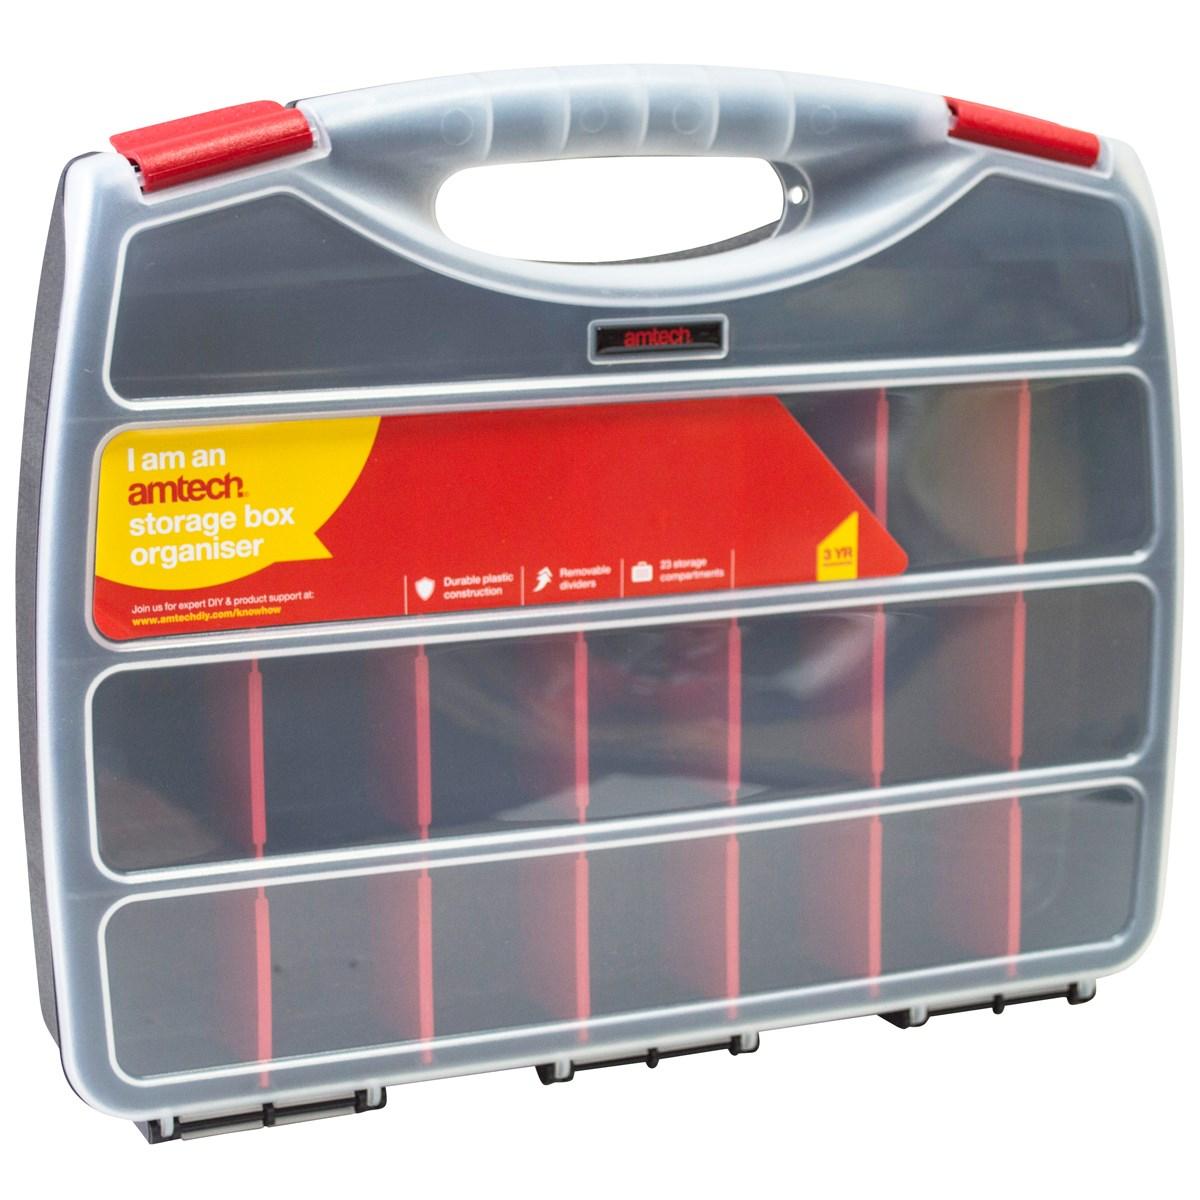 23 section single sided storage box - Amtech